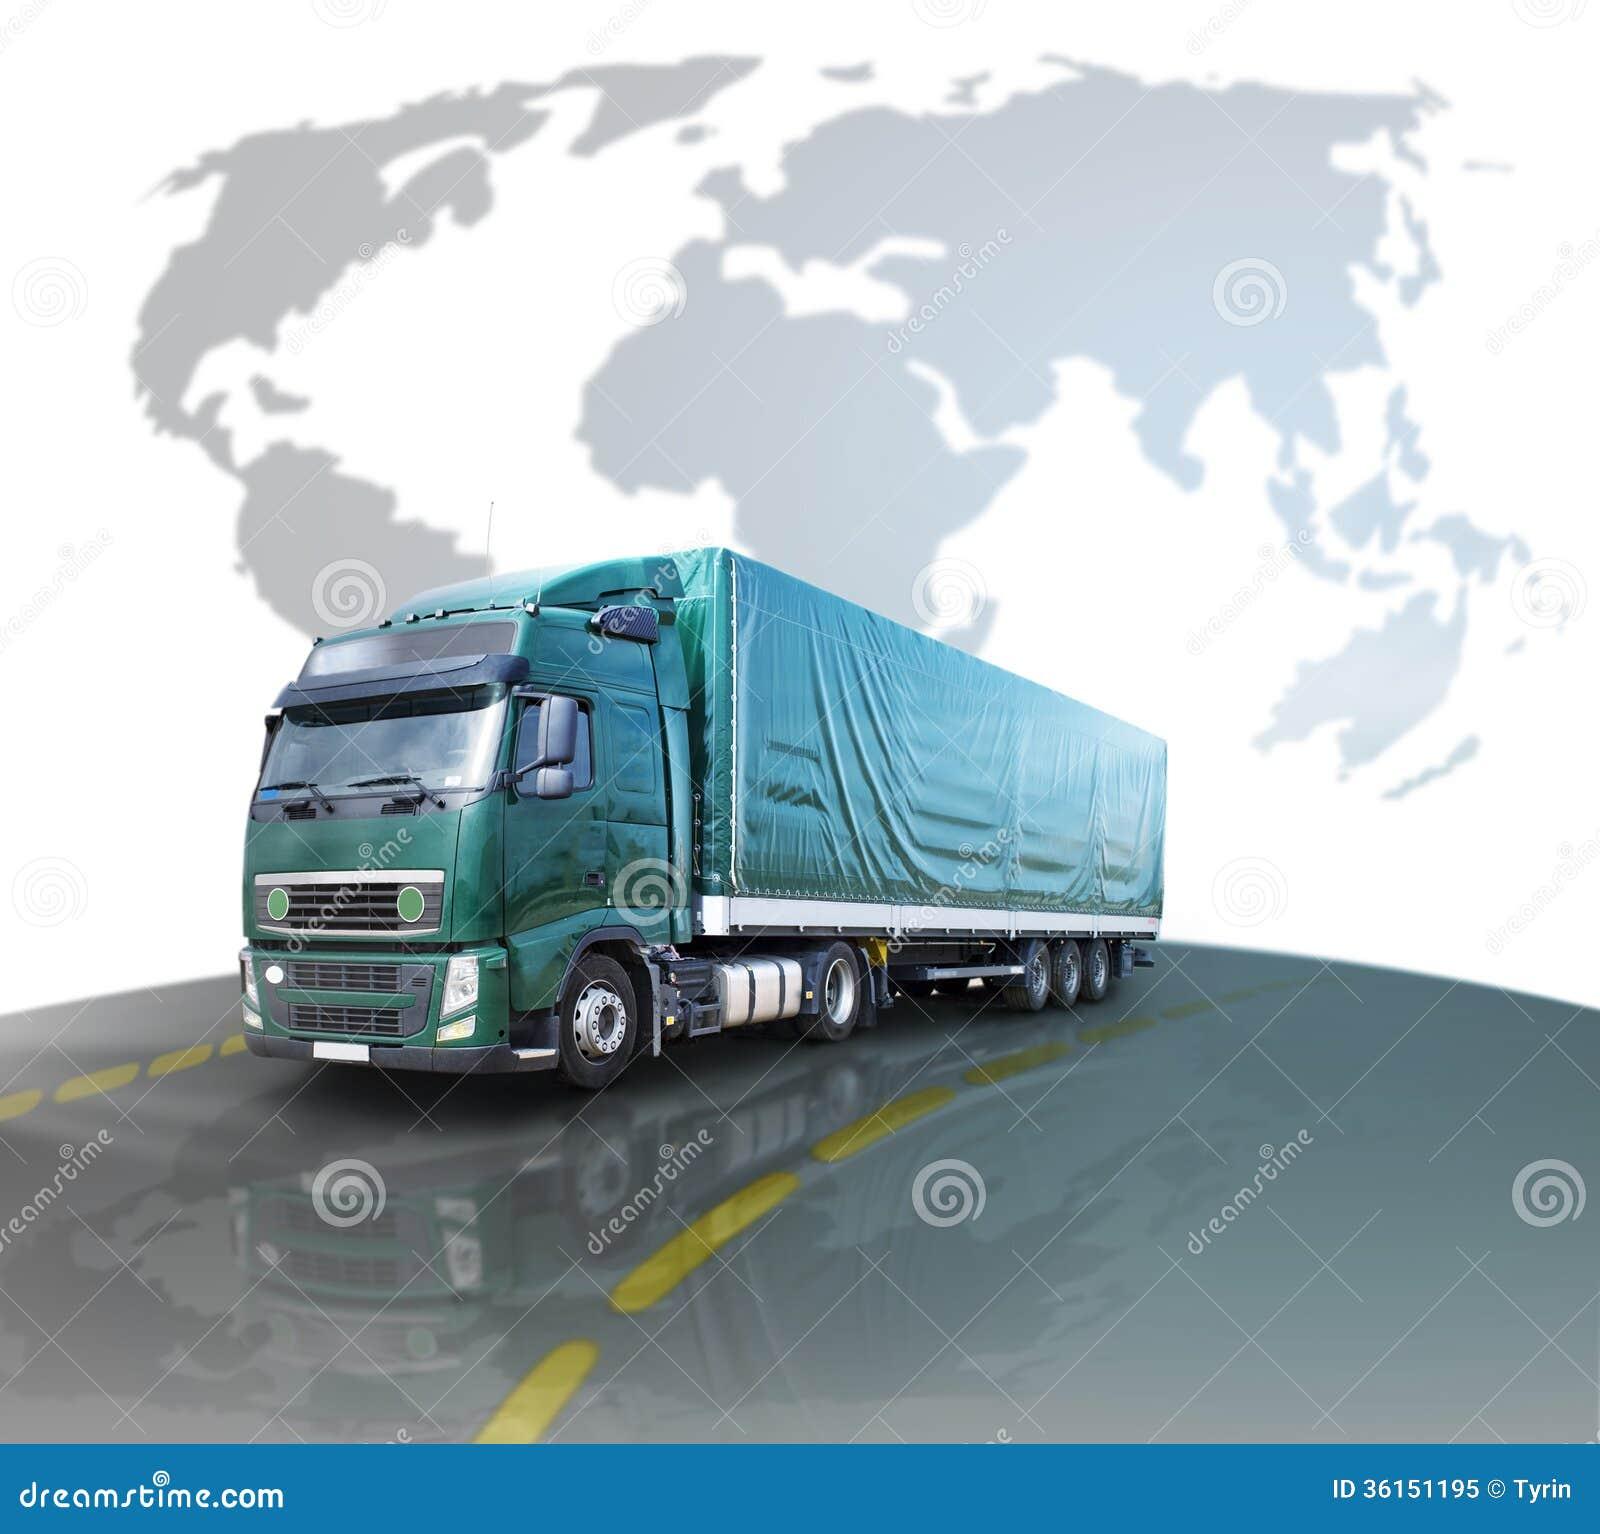 Truck Royalty Free Stock Photo - Image: 36151195